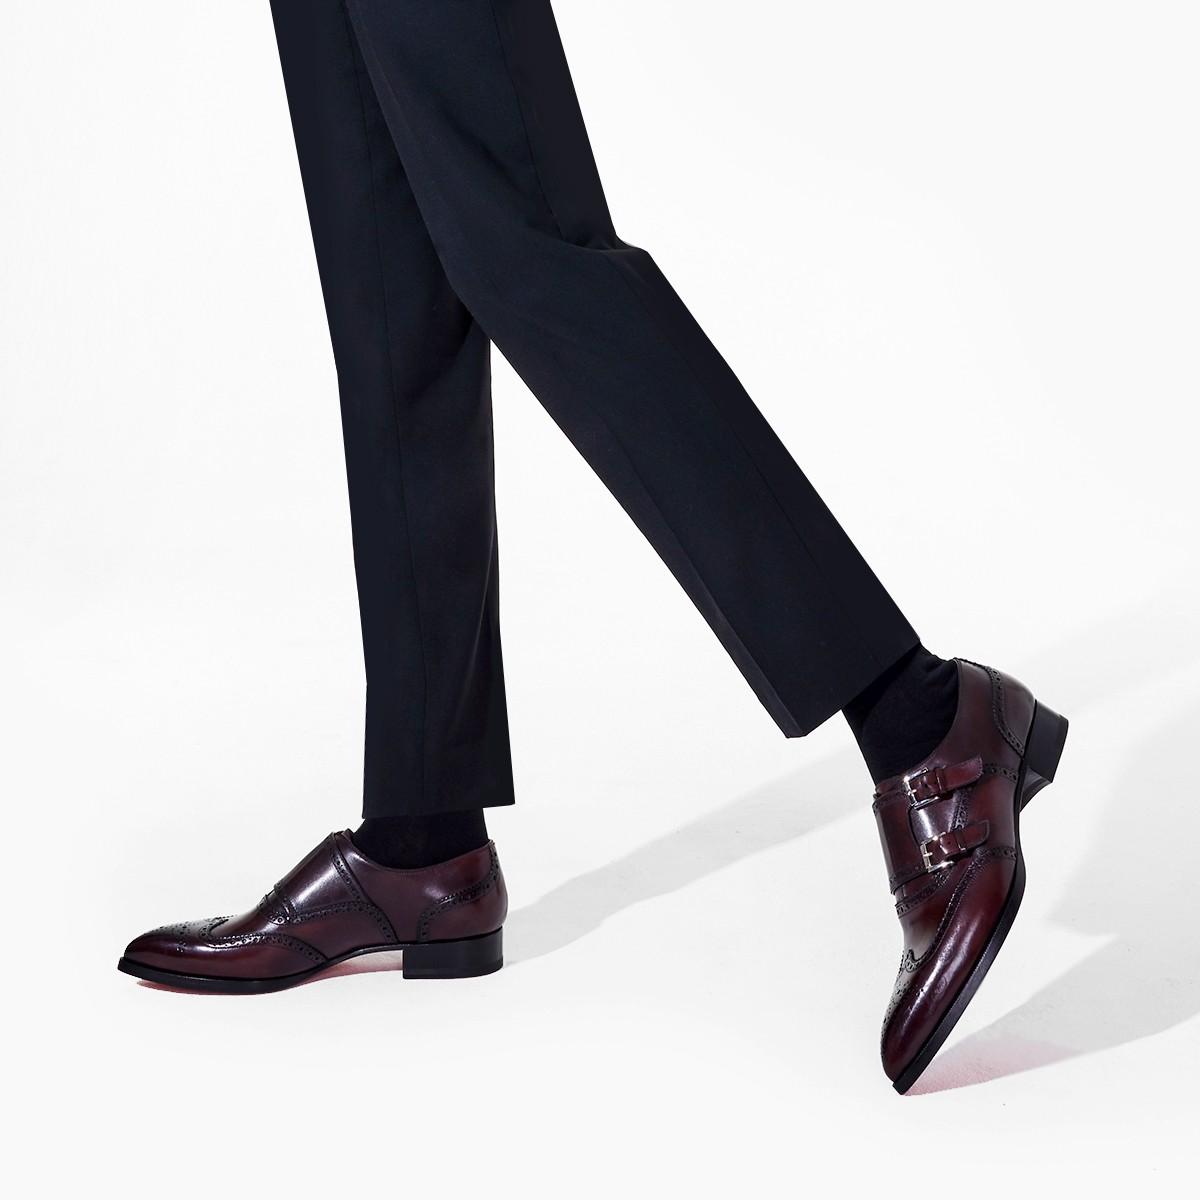 Shoes - Floritok - Christian Louboutin